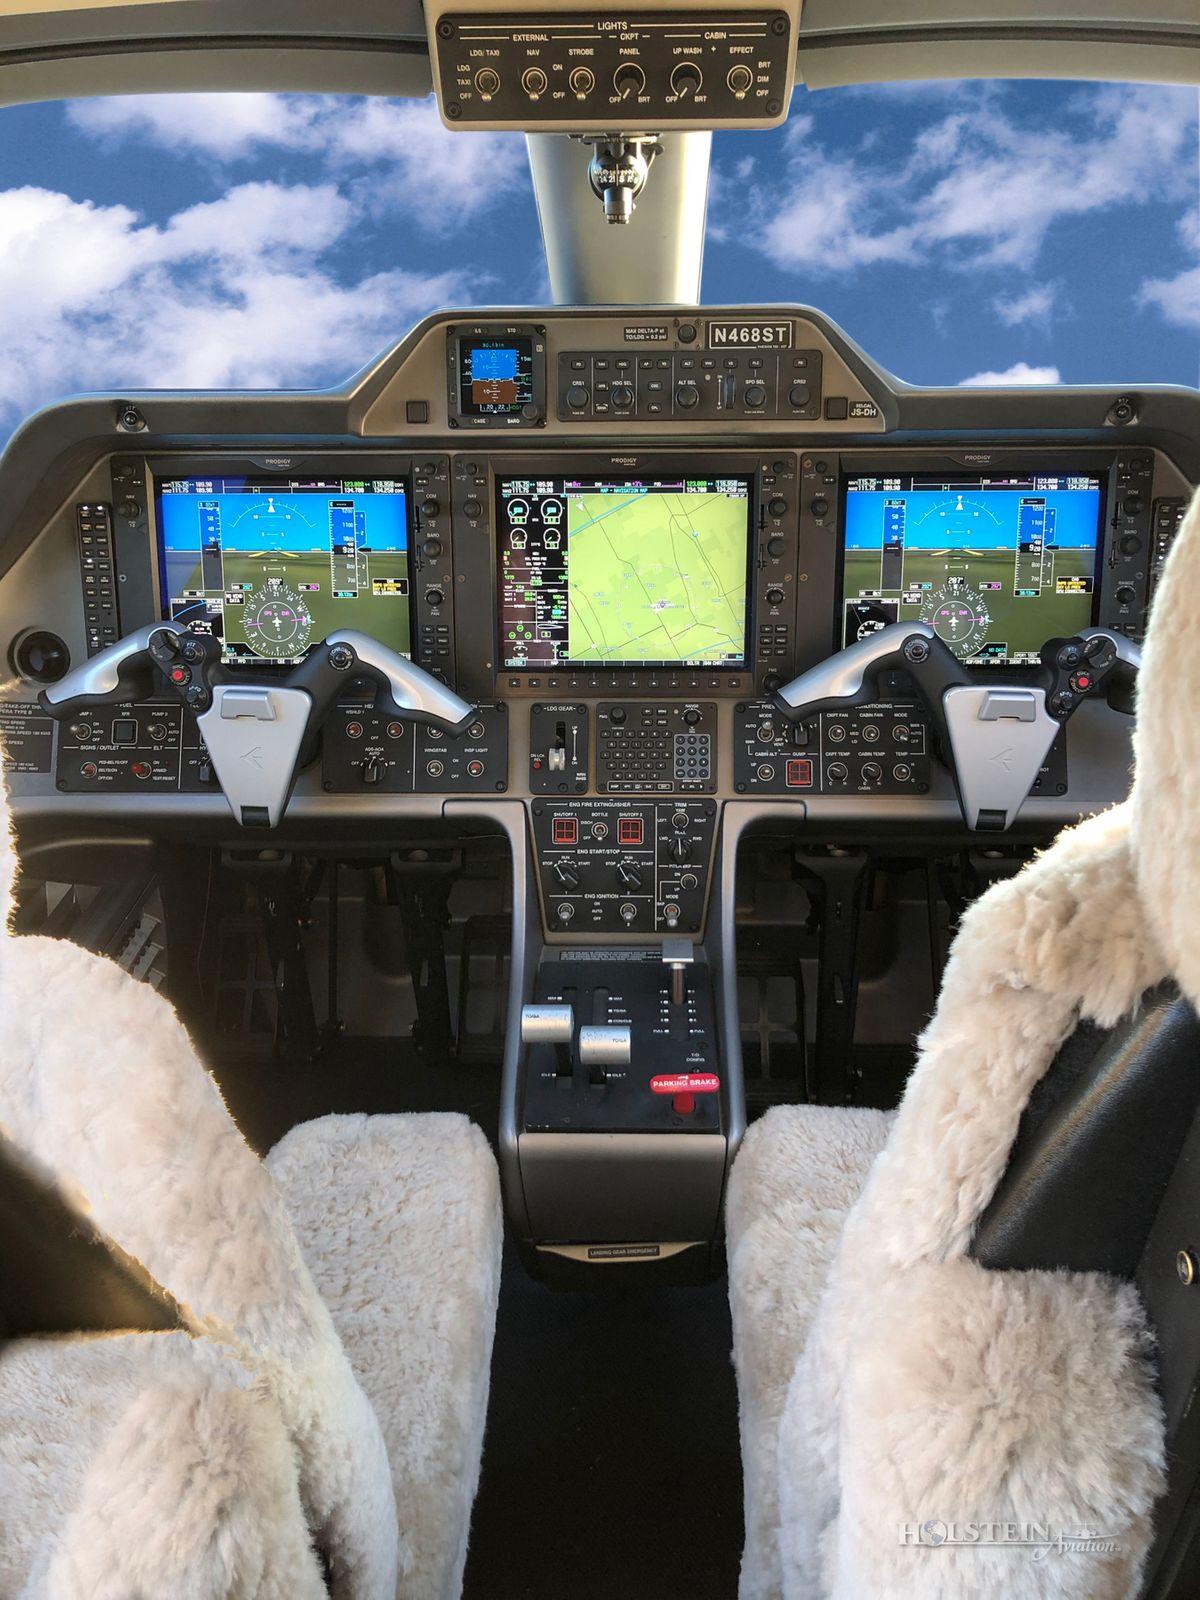 2011 Embraer Phenom 100 - 50000237 - N468ST - Cockpit RGB.jpg